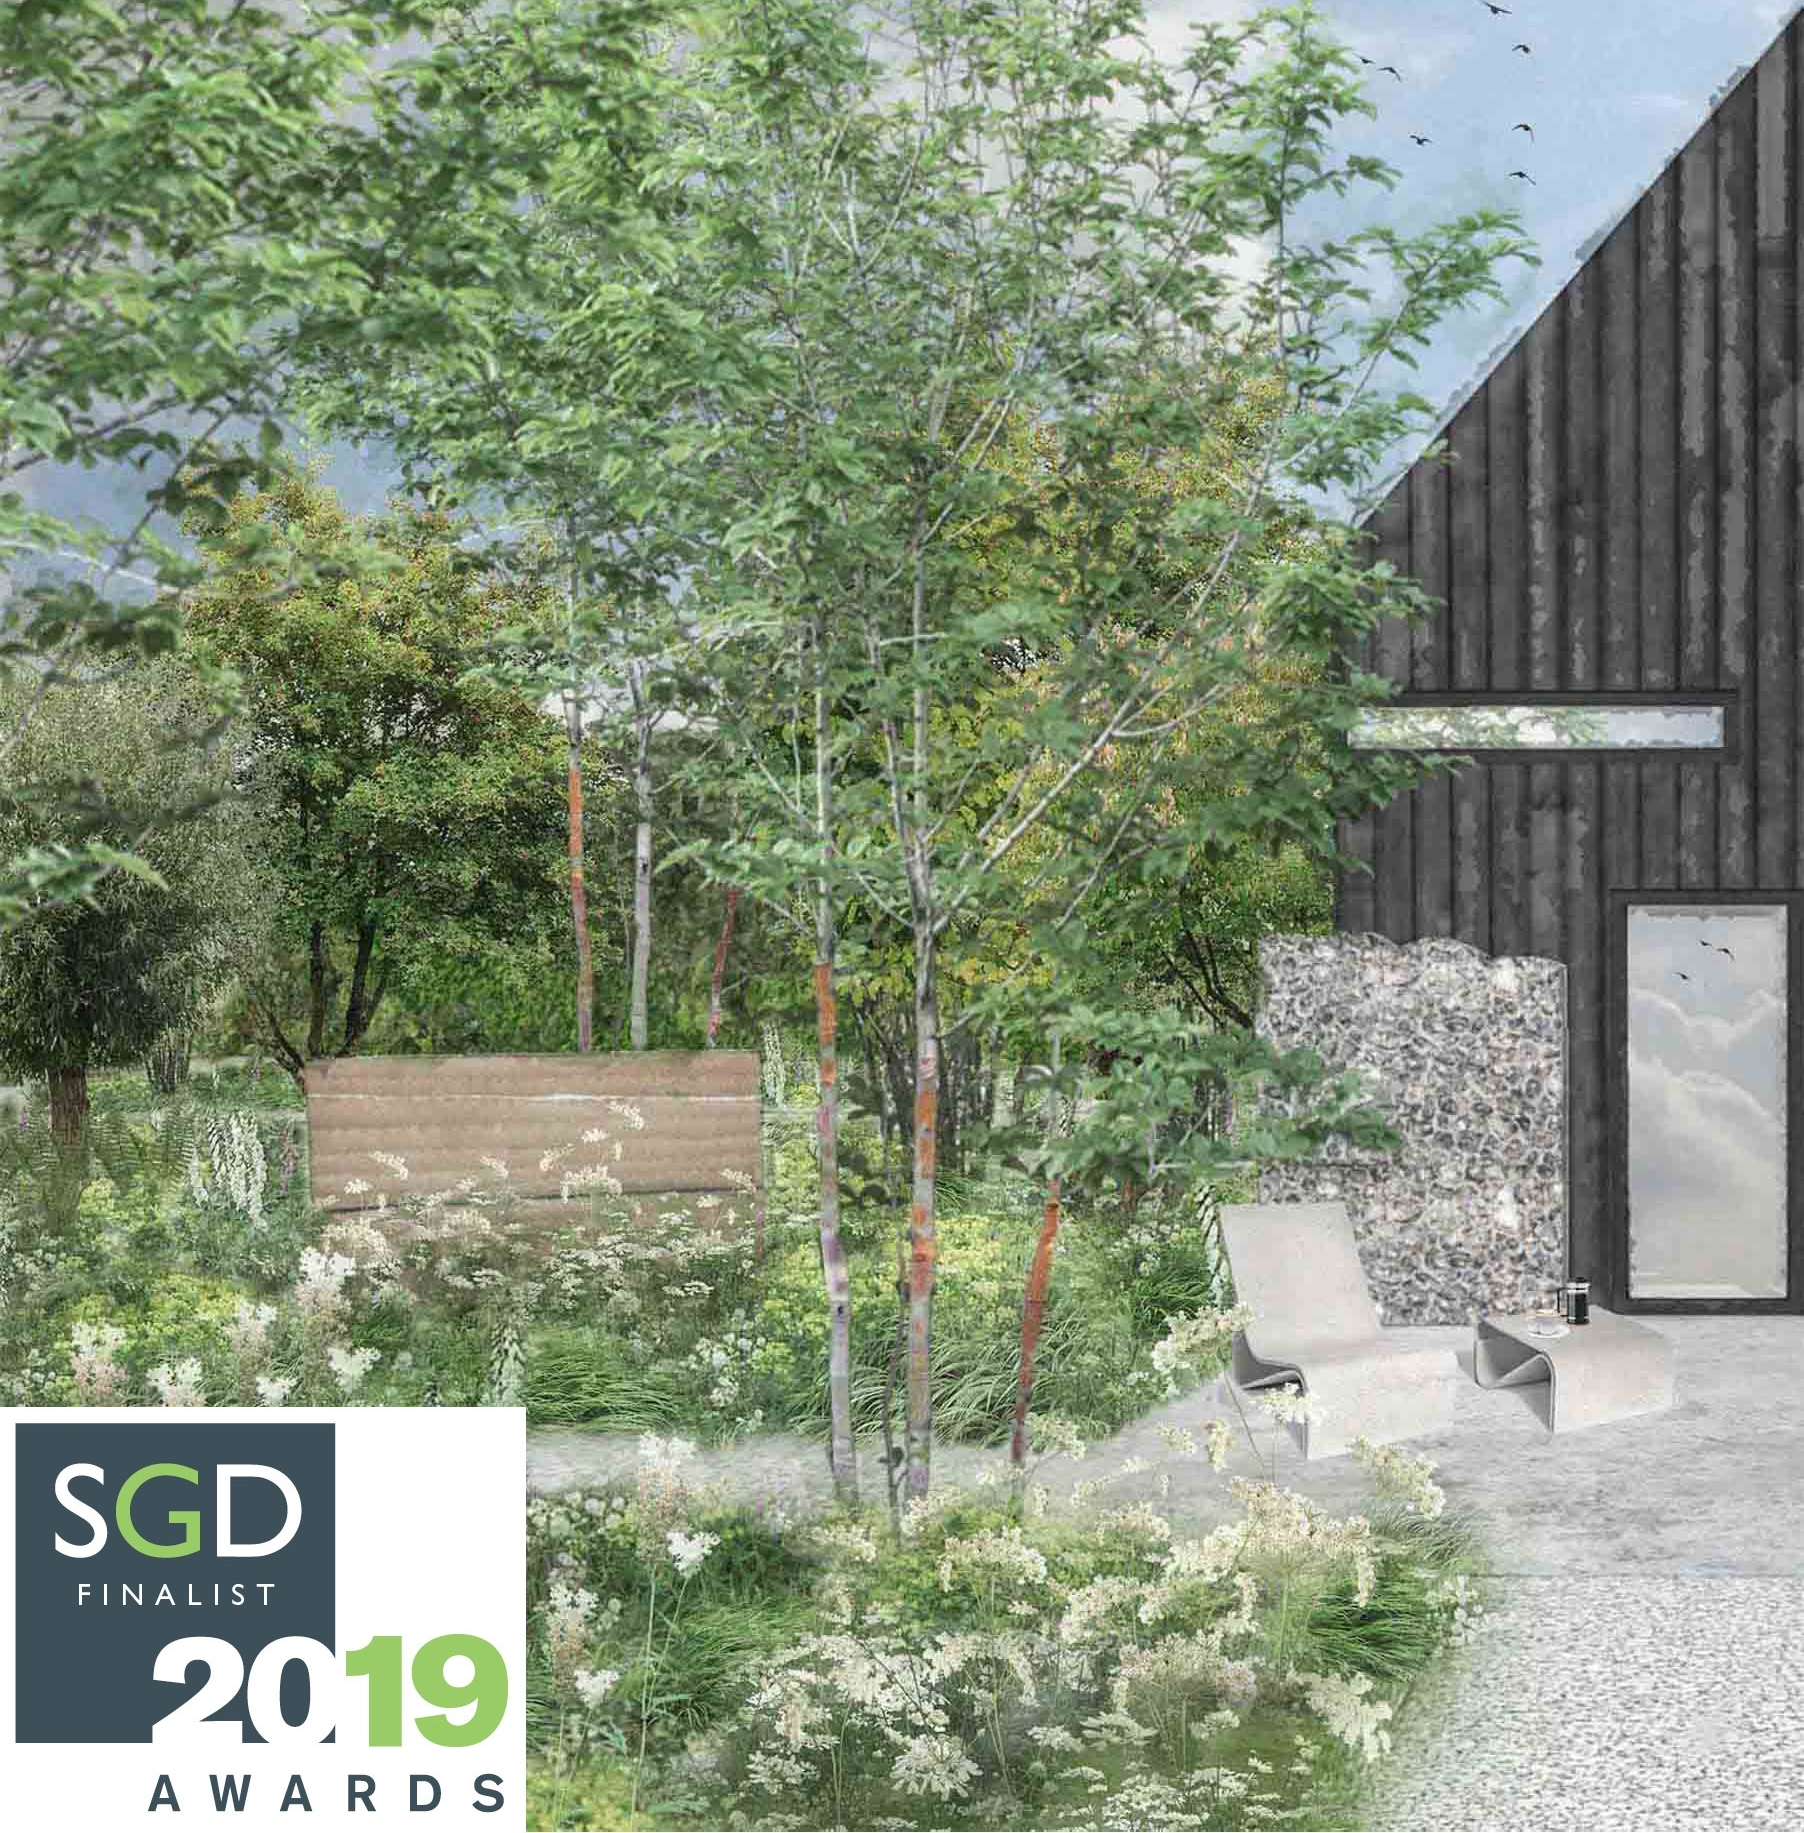 modern country garden studio woodland society of garden designers awards finalist.jpg